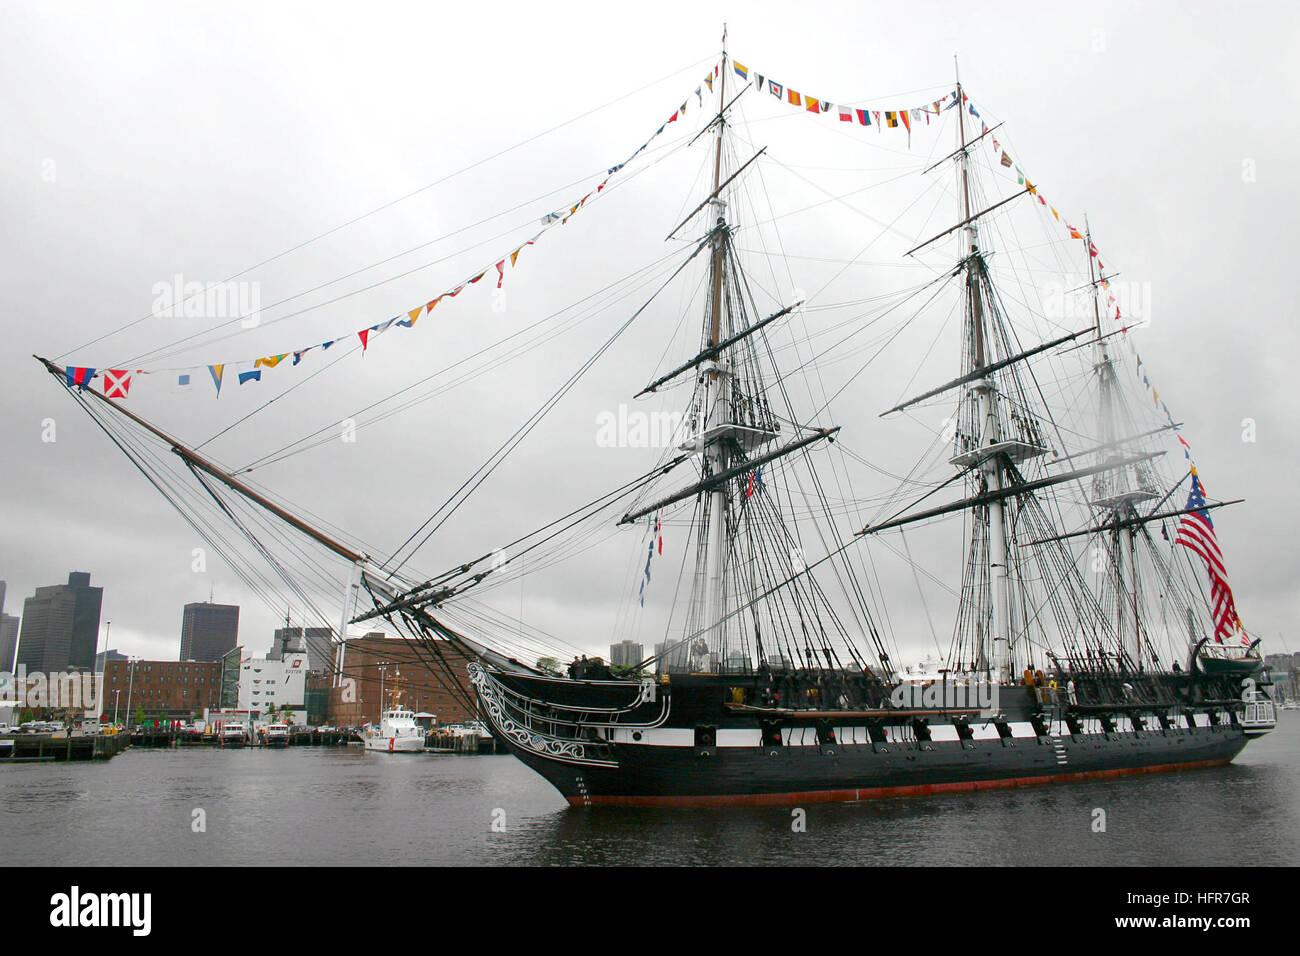 060610-N-8110K-022 de Boston, Massachusetts (Junio 10, 2006) Ð USS Constitution, ÒOld IronsidesÓ Imagen De Stock